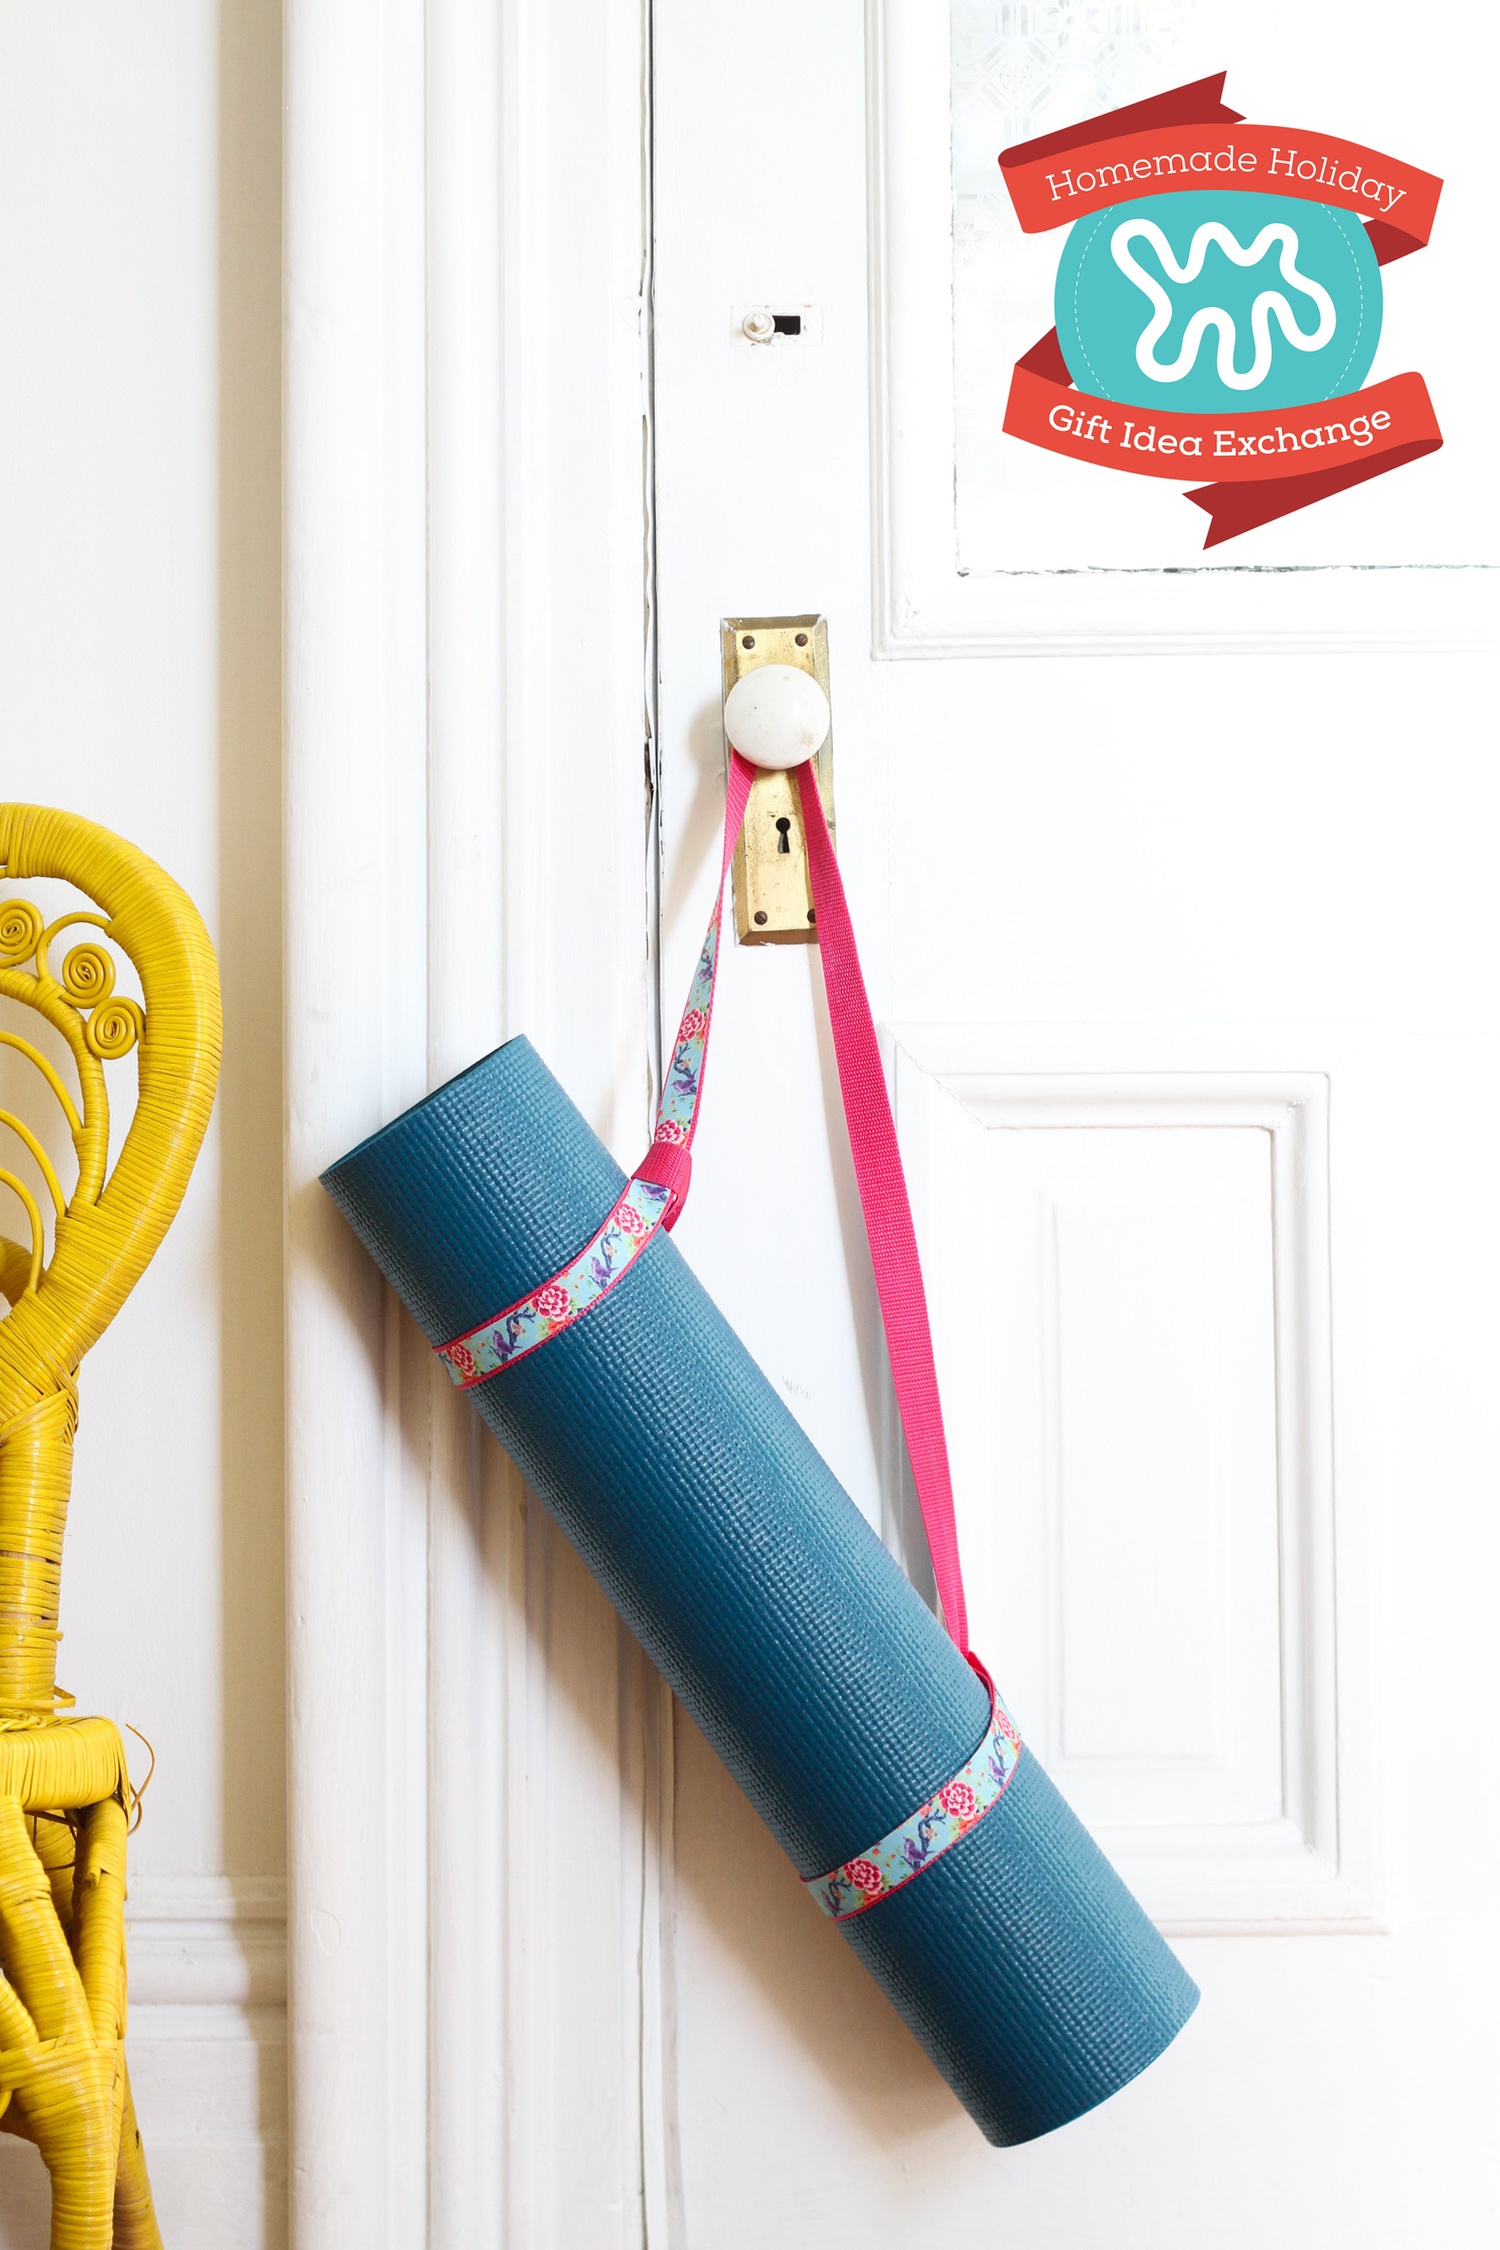 Homemade Holiday Gift Idea: Make A No-Sew Yoga Mat Strap | Yoga ...